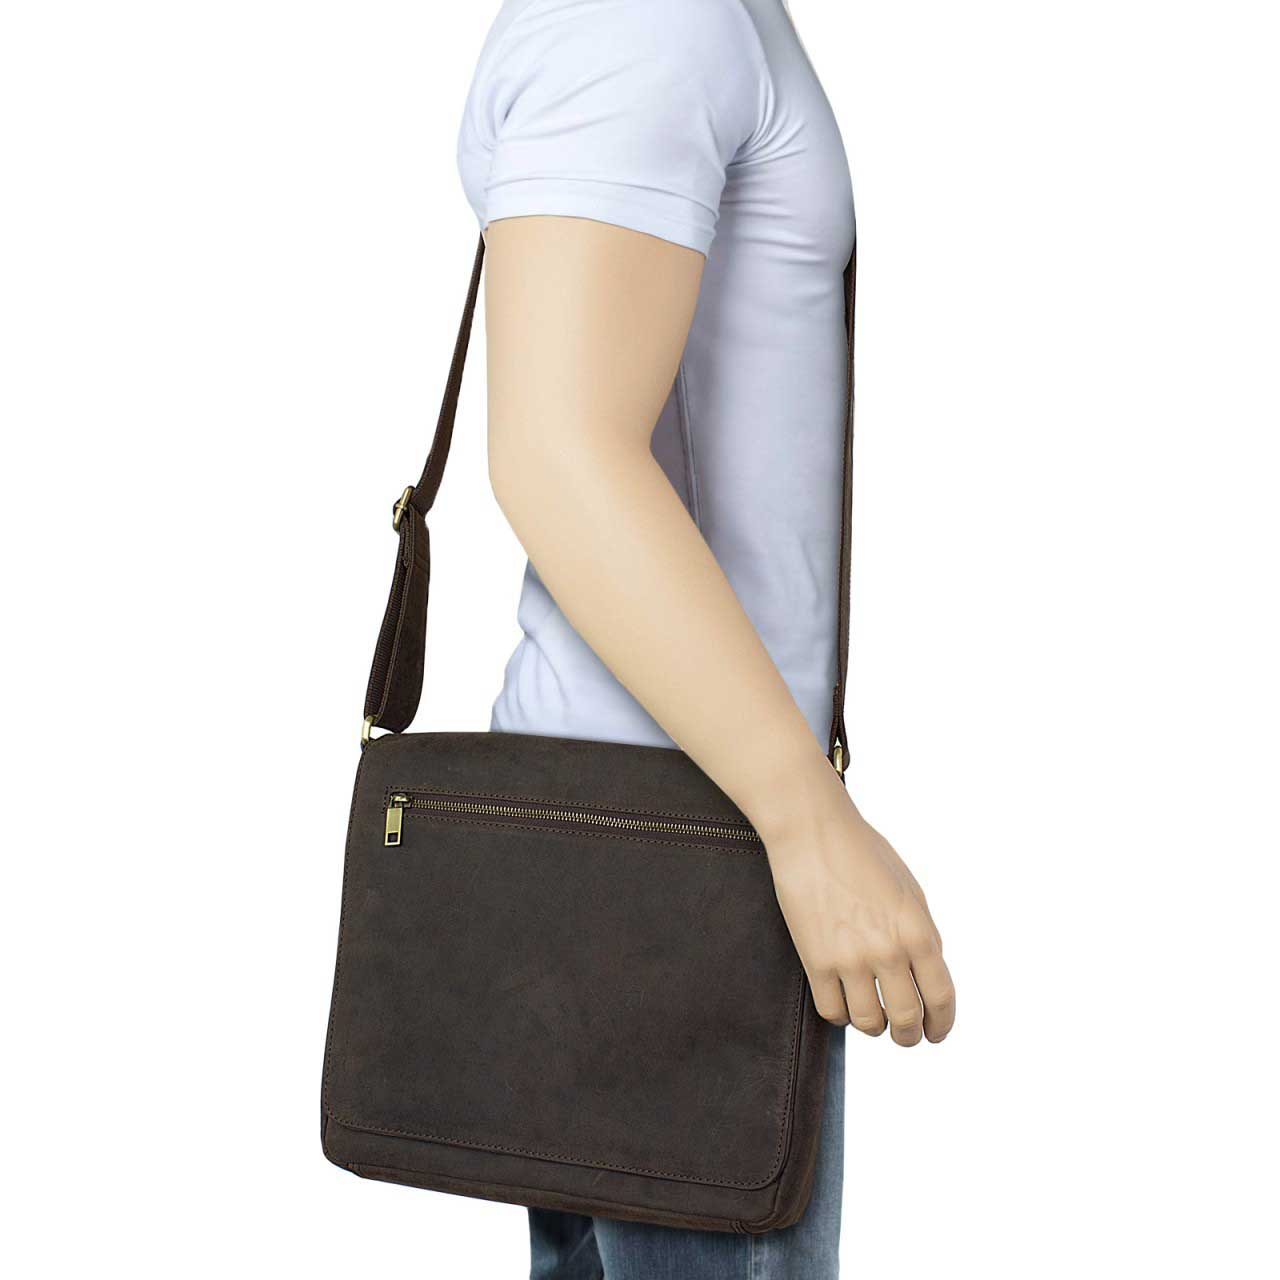 STILORD Leder Messenger Bag kompakt Vintage Schulter Umhängetasche 12.2 Zoll Tablets MacBook Tasche echtes Leder dunkelbraun - Bild 7